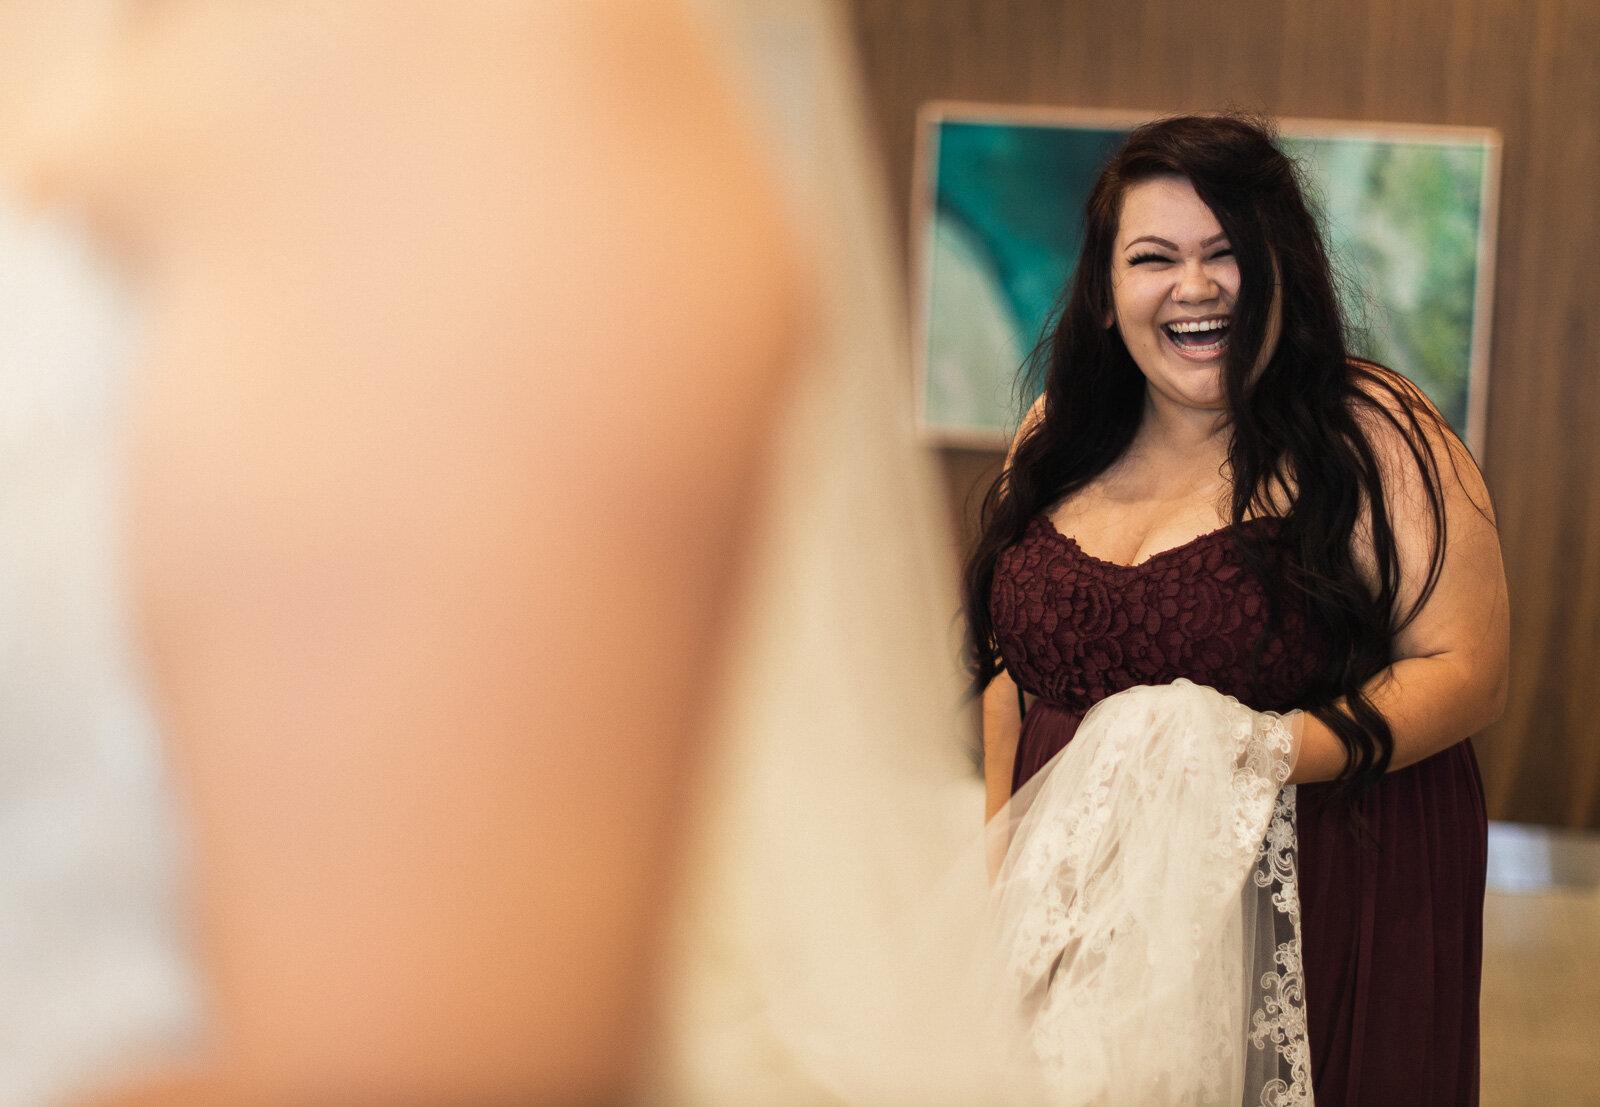 jessica-liam-wedding-blog-8.jpg